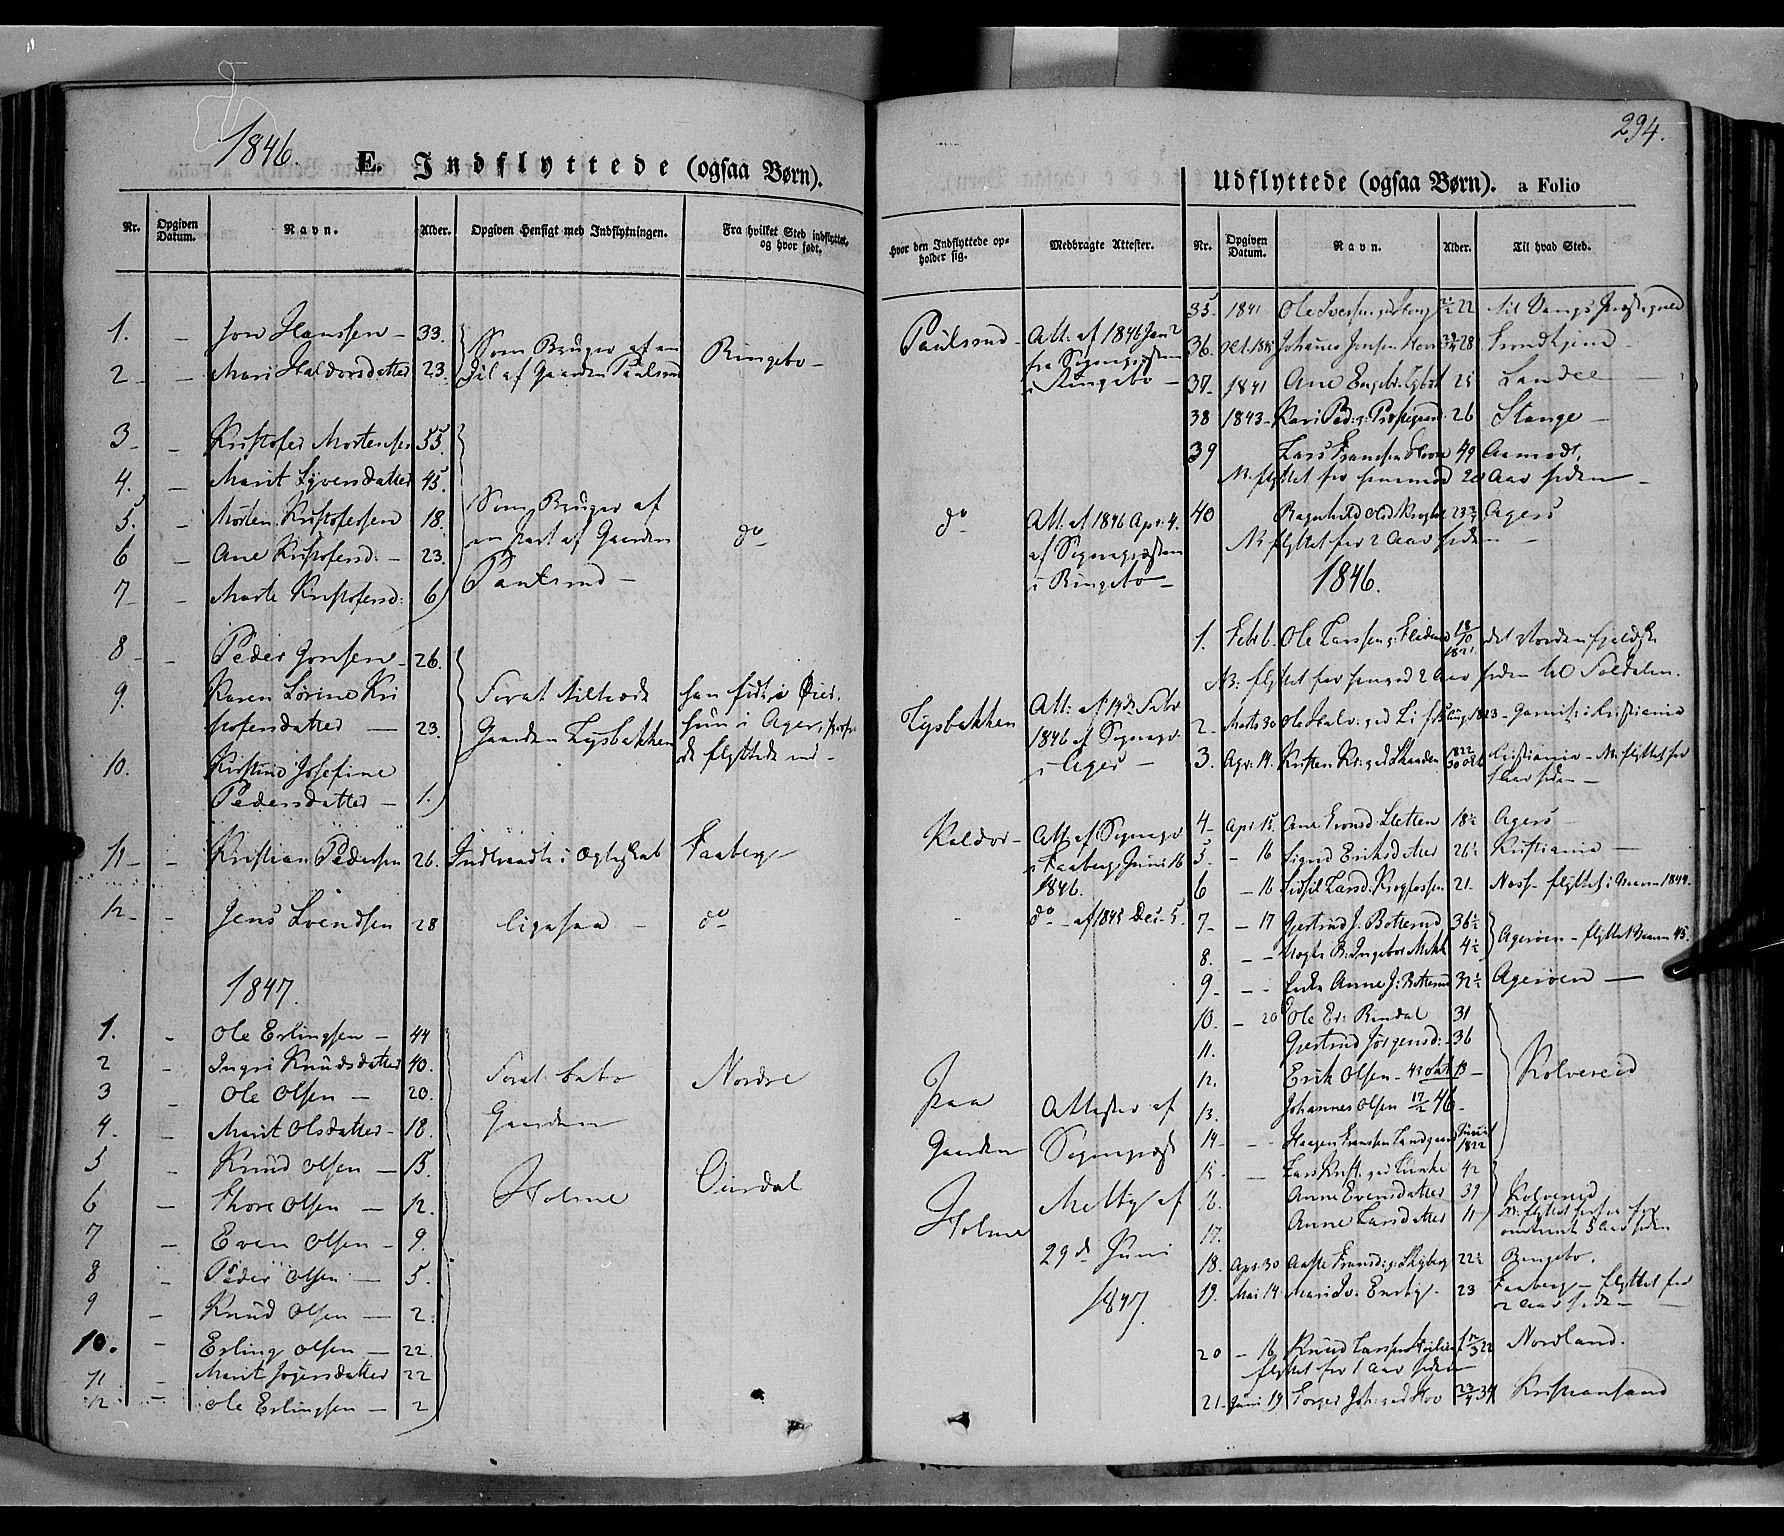 SAH, Øyer prestekontor, Ministerialbok nr. 5, 1842-1857, s. 294